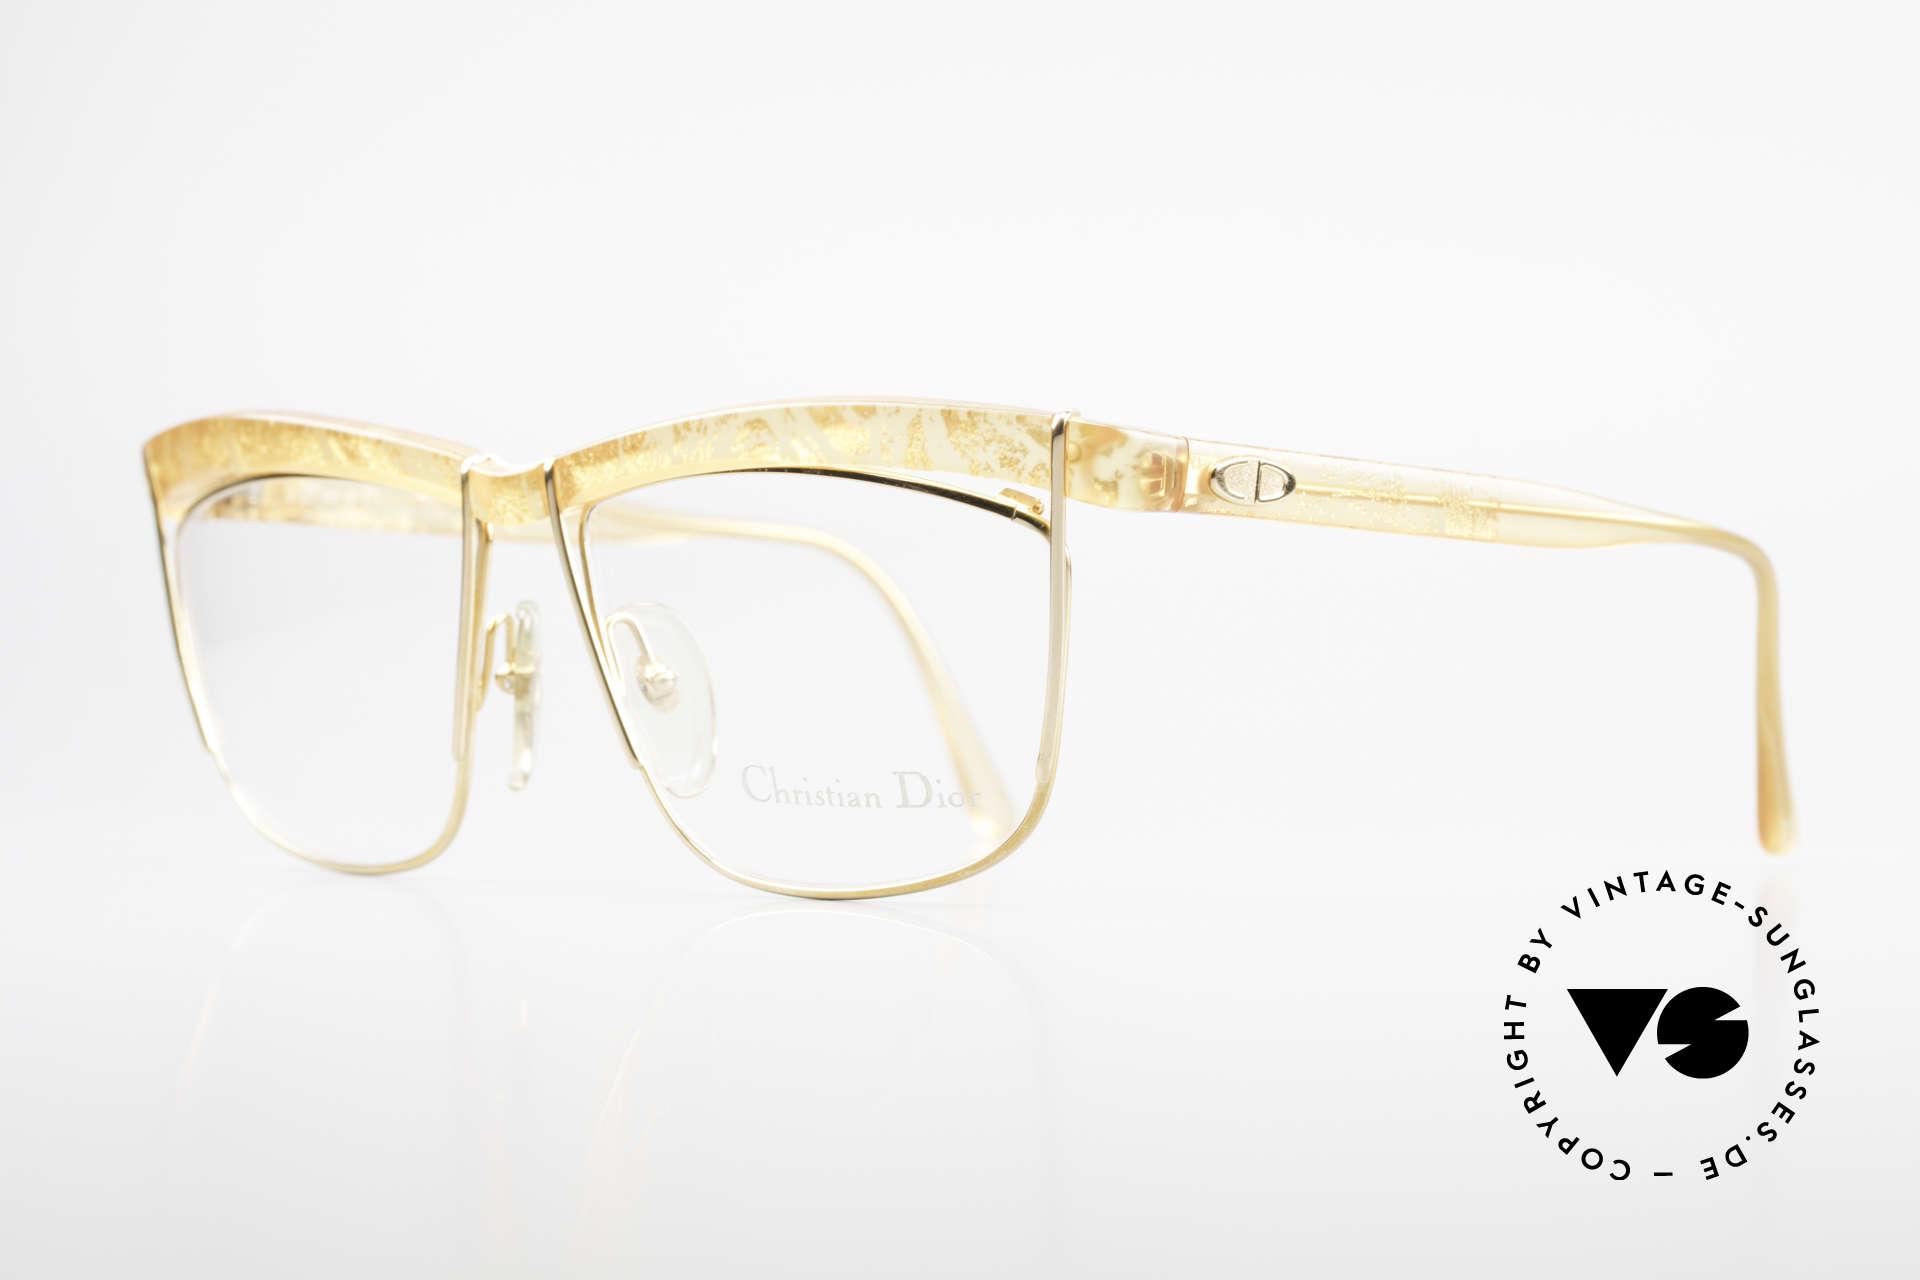 Christian Dior 2552 90er Vintage Brille Damen, tolle Kombination v. Formen/Muster/Materialien, Passend für Damen